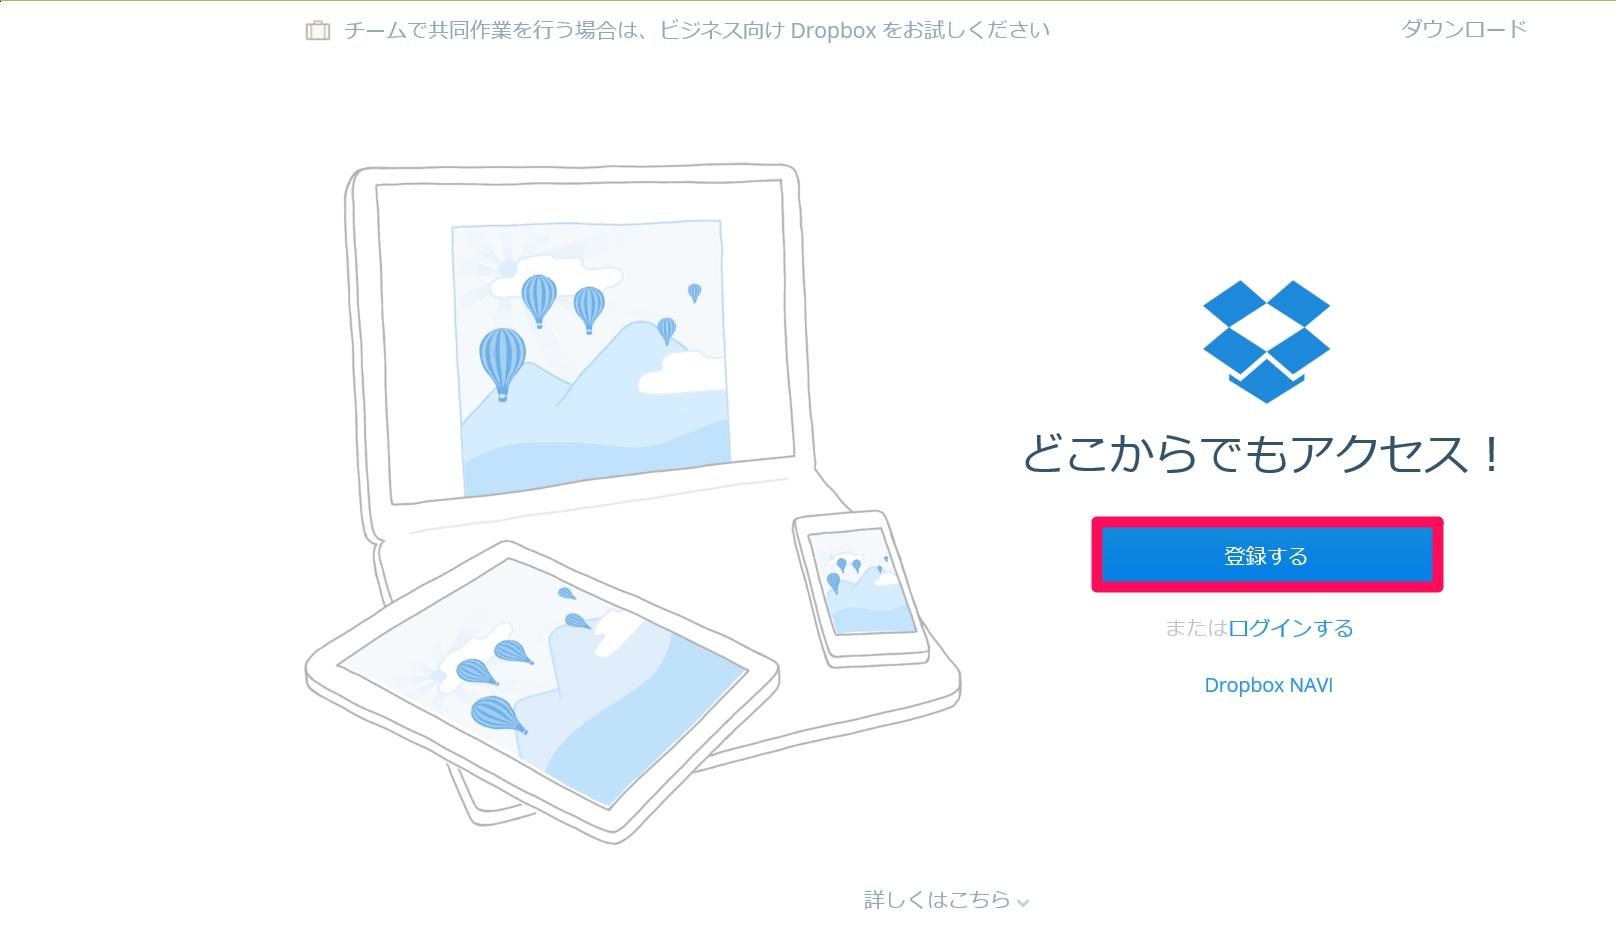 Dropbox.comのサイトから登録画面に進む